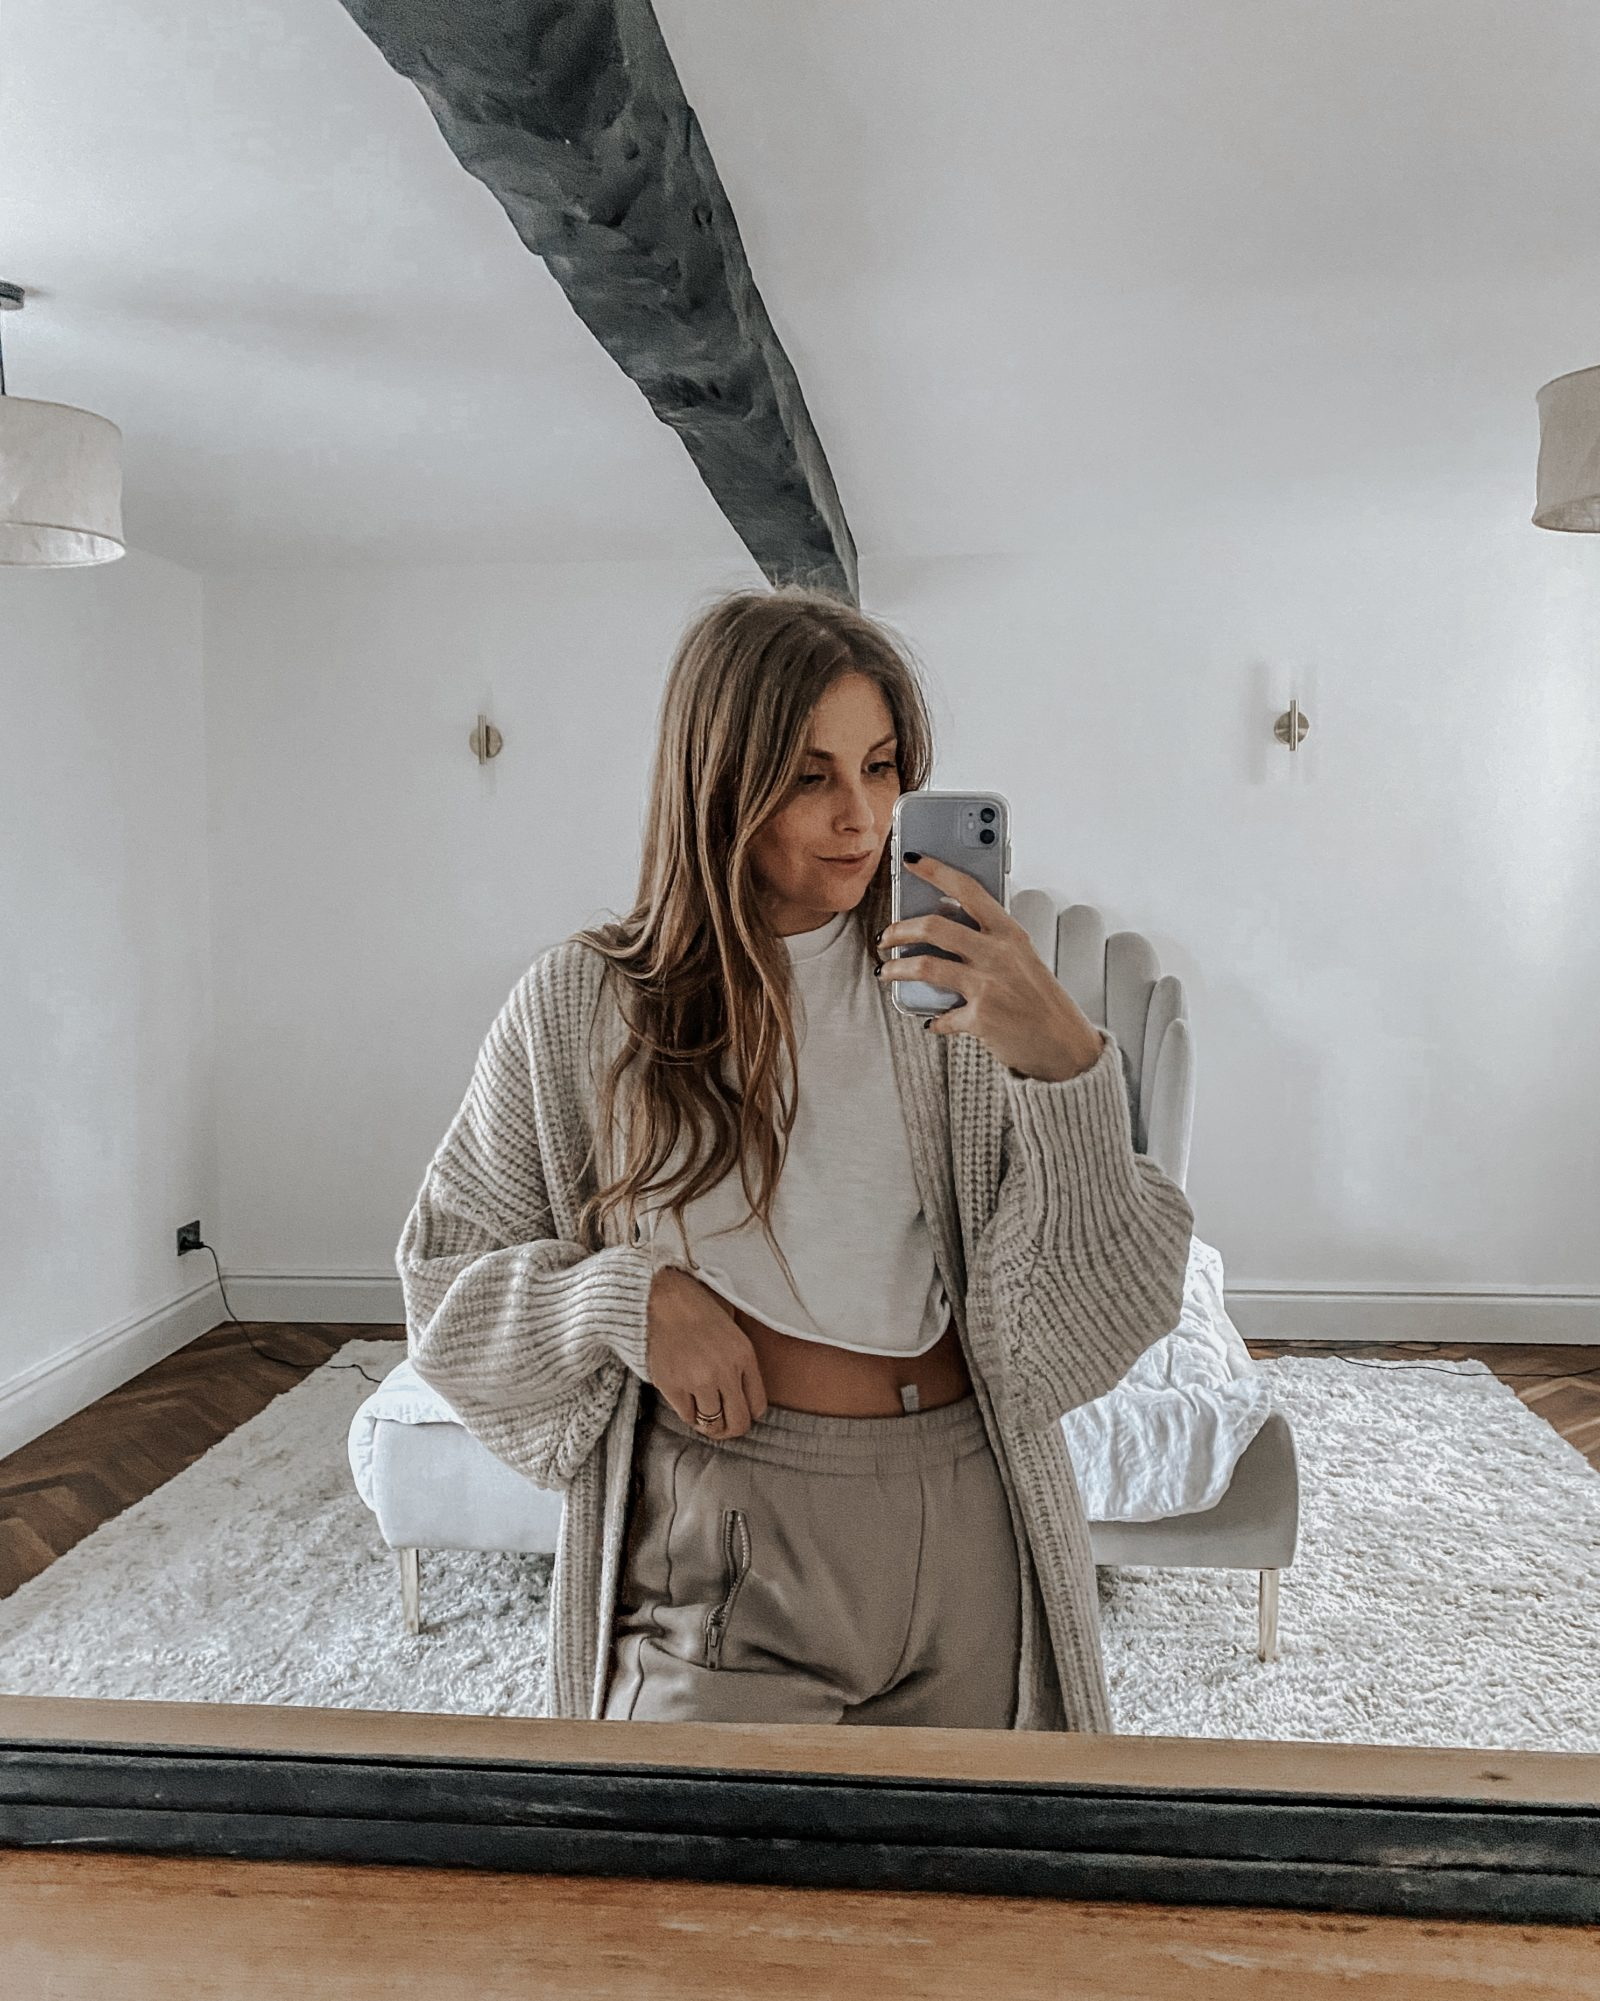 Asos Loungewear Lookbook - Neutral Style 2020